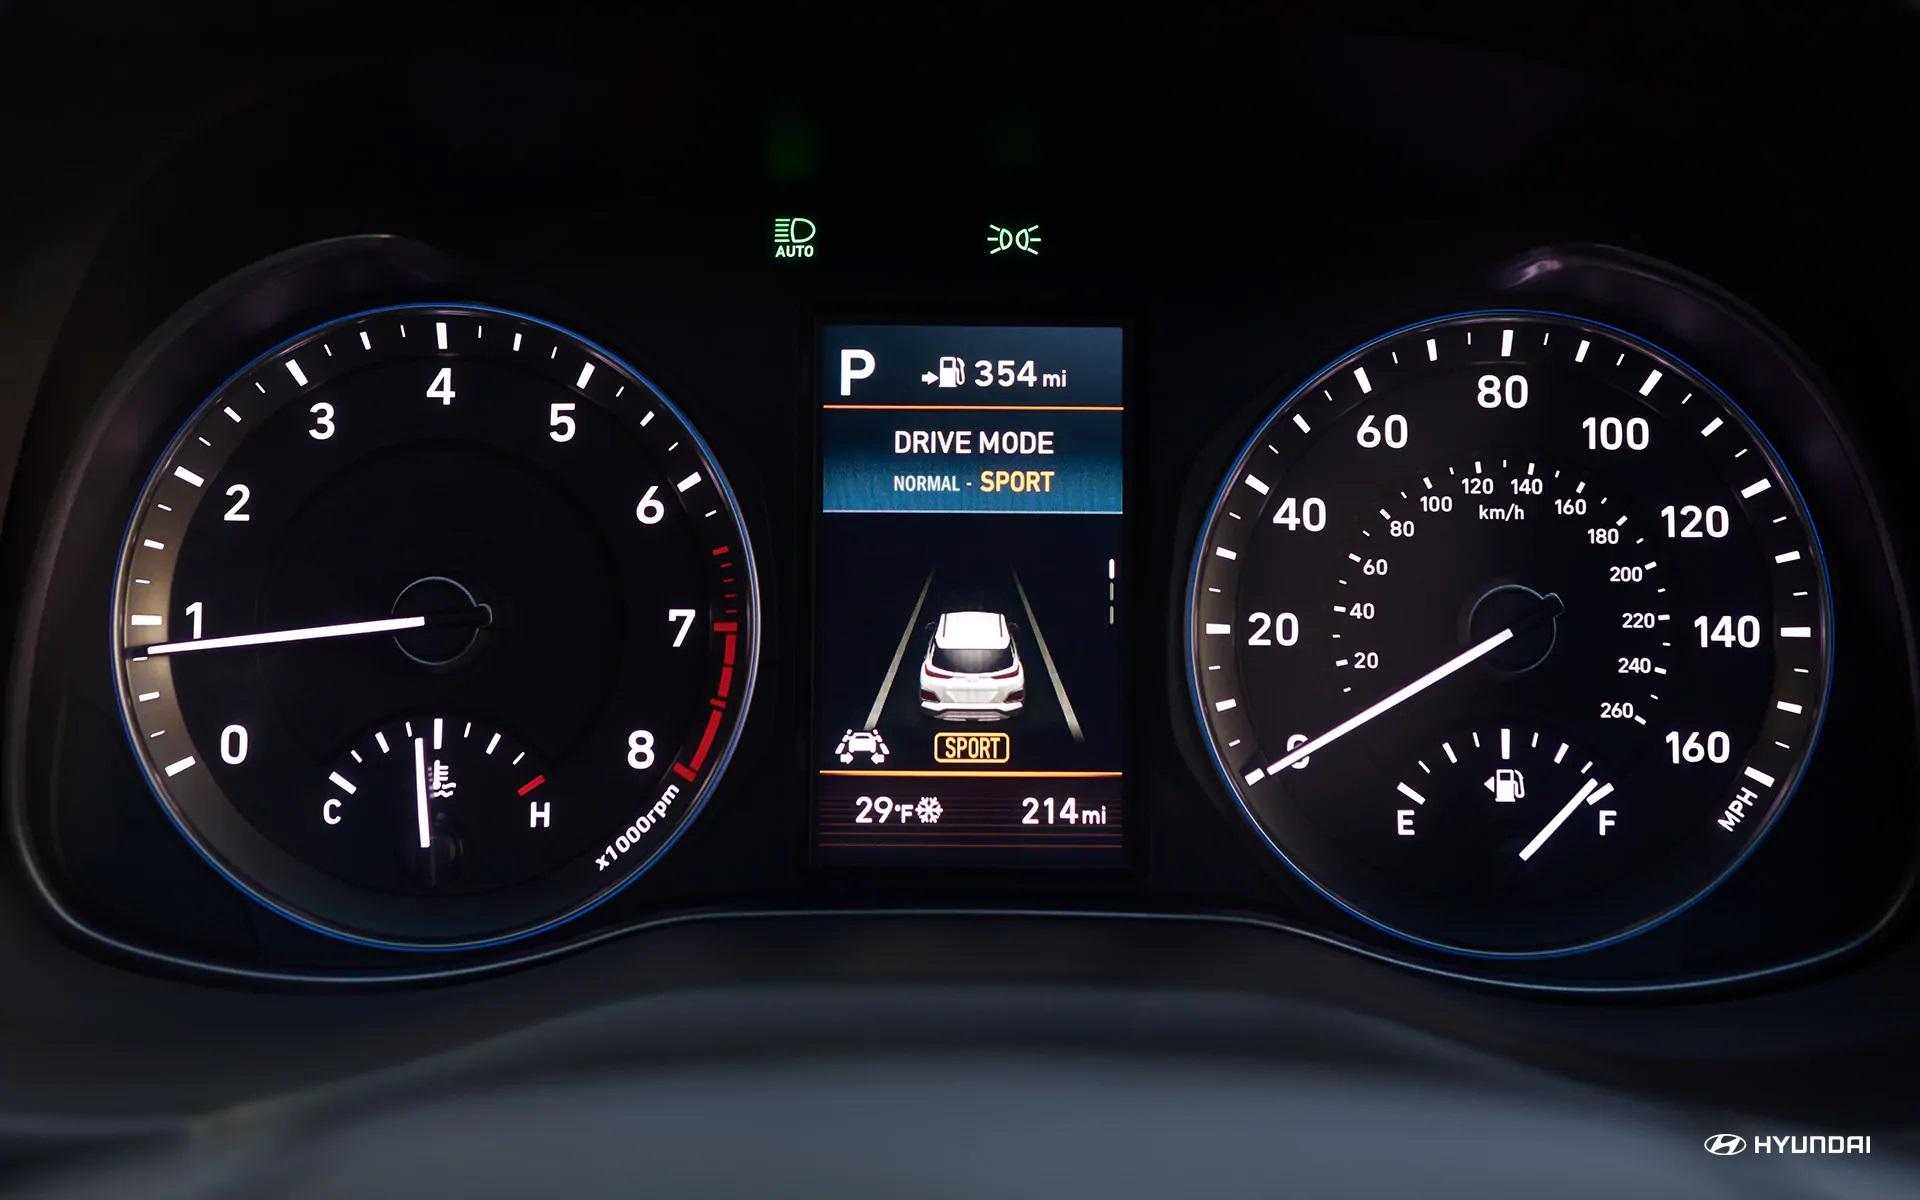 2019 Hyundai Kona Instrument Cluster